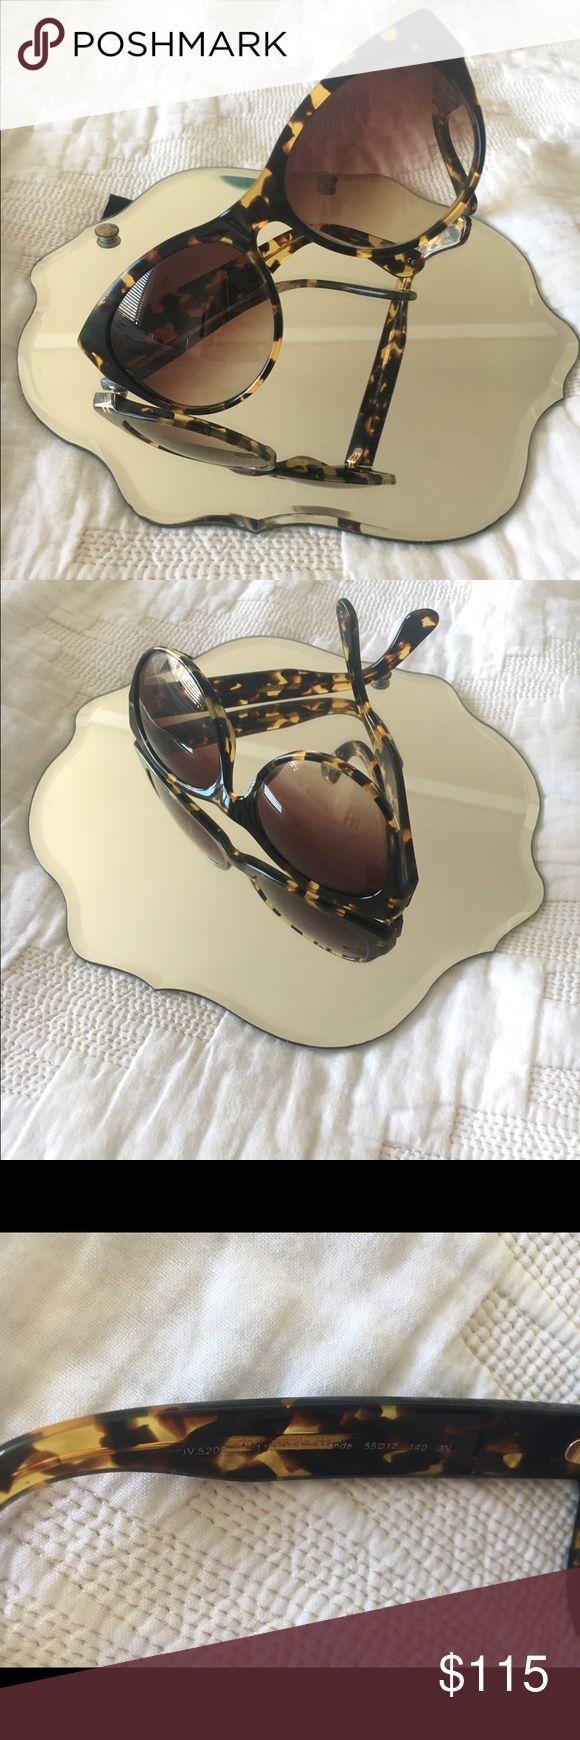 Oliver People's tortoise shell sunglasses Super cute and chic Oliver Peoples sunnies! Oliver Peoples Accessories Sunglasses